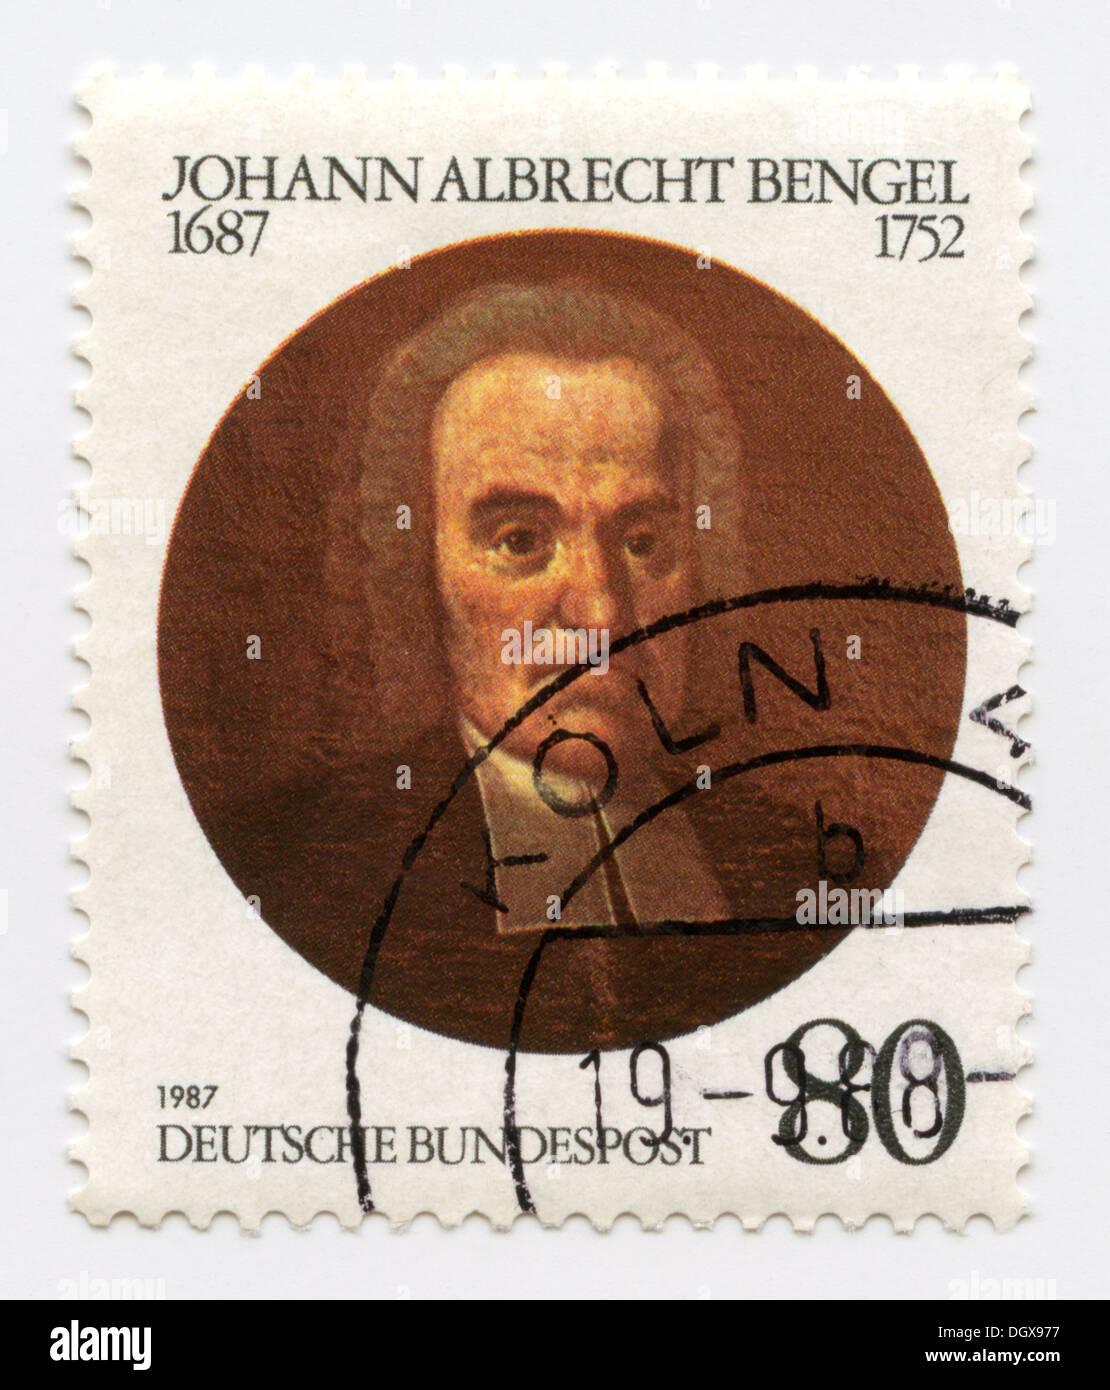 Germany postage stamp depicting Johann Albrecht Bengel, a Lutheran pietist clergyman and Greek-language scholar - Stock Image